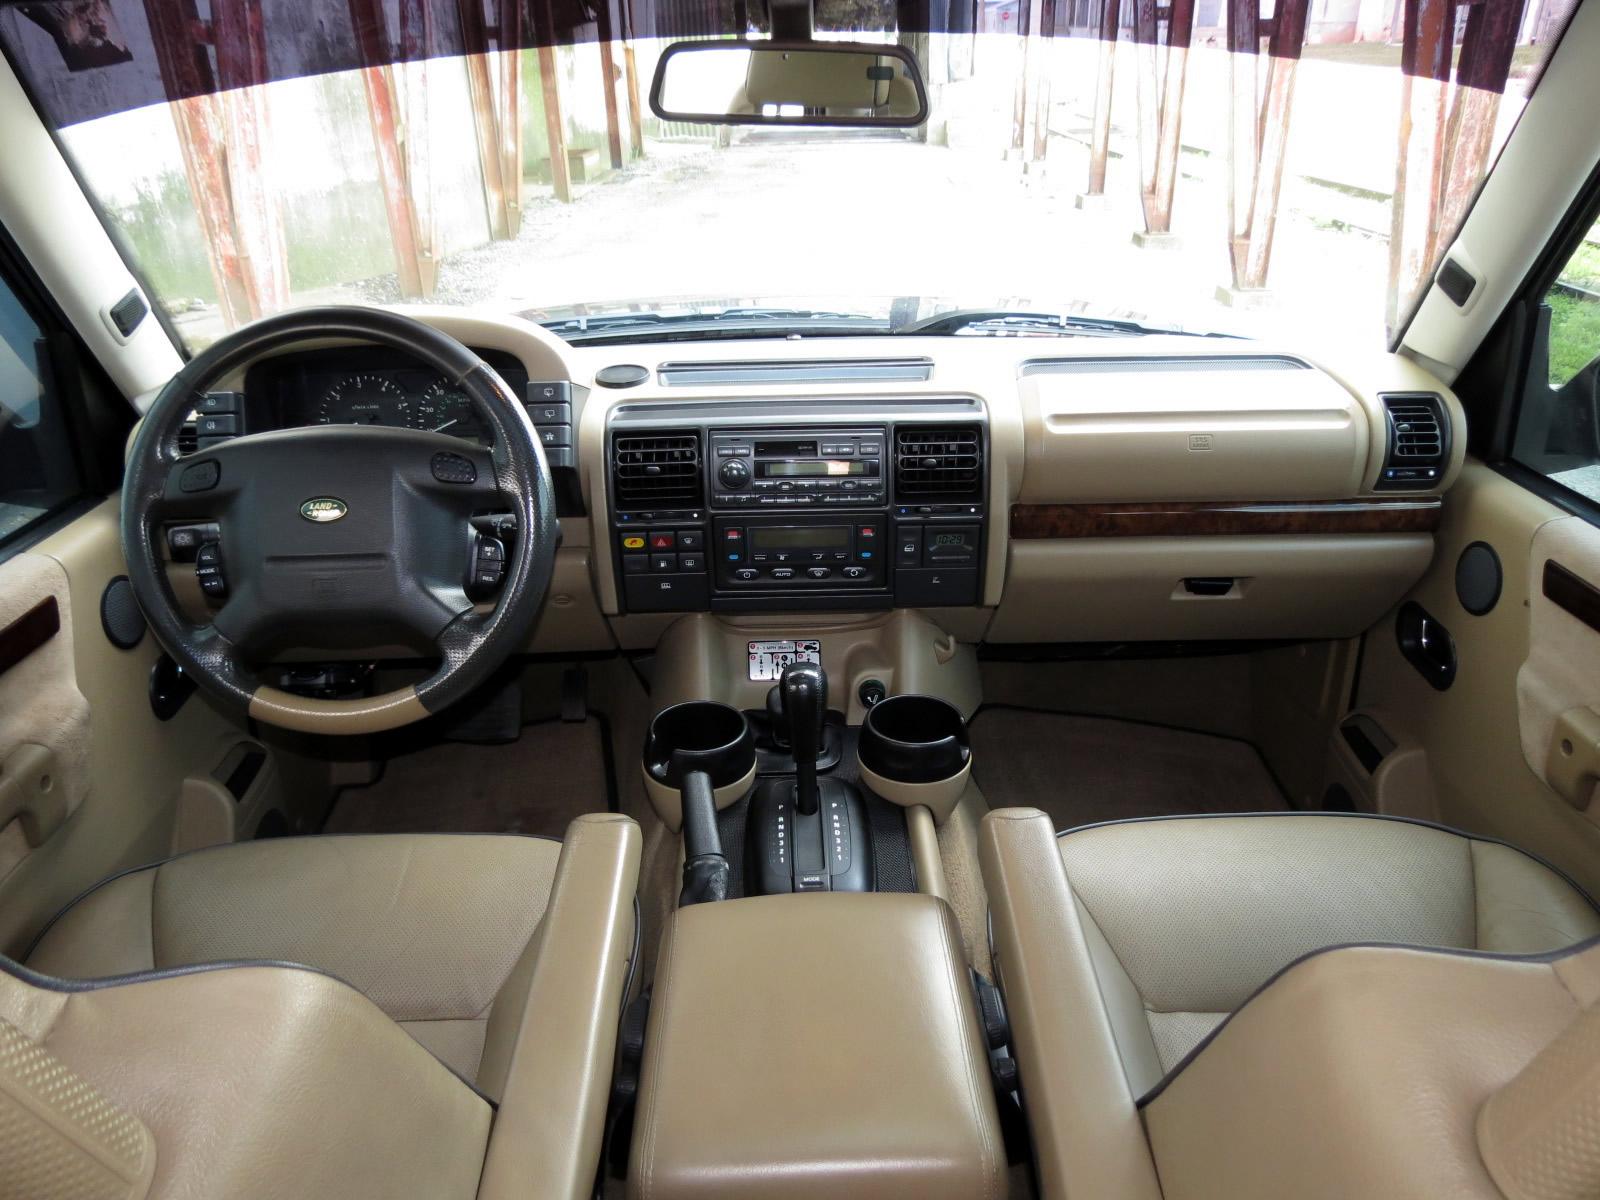 Land rover discovery 2002 interior for Land rover 2000 interior